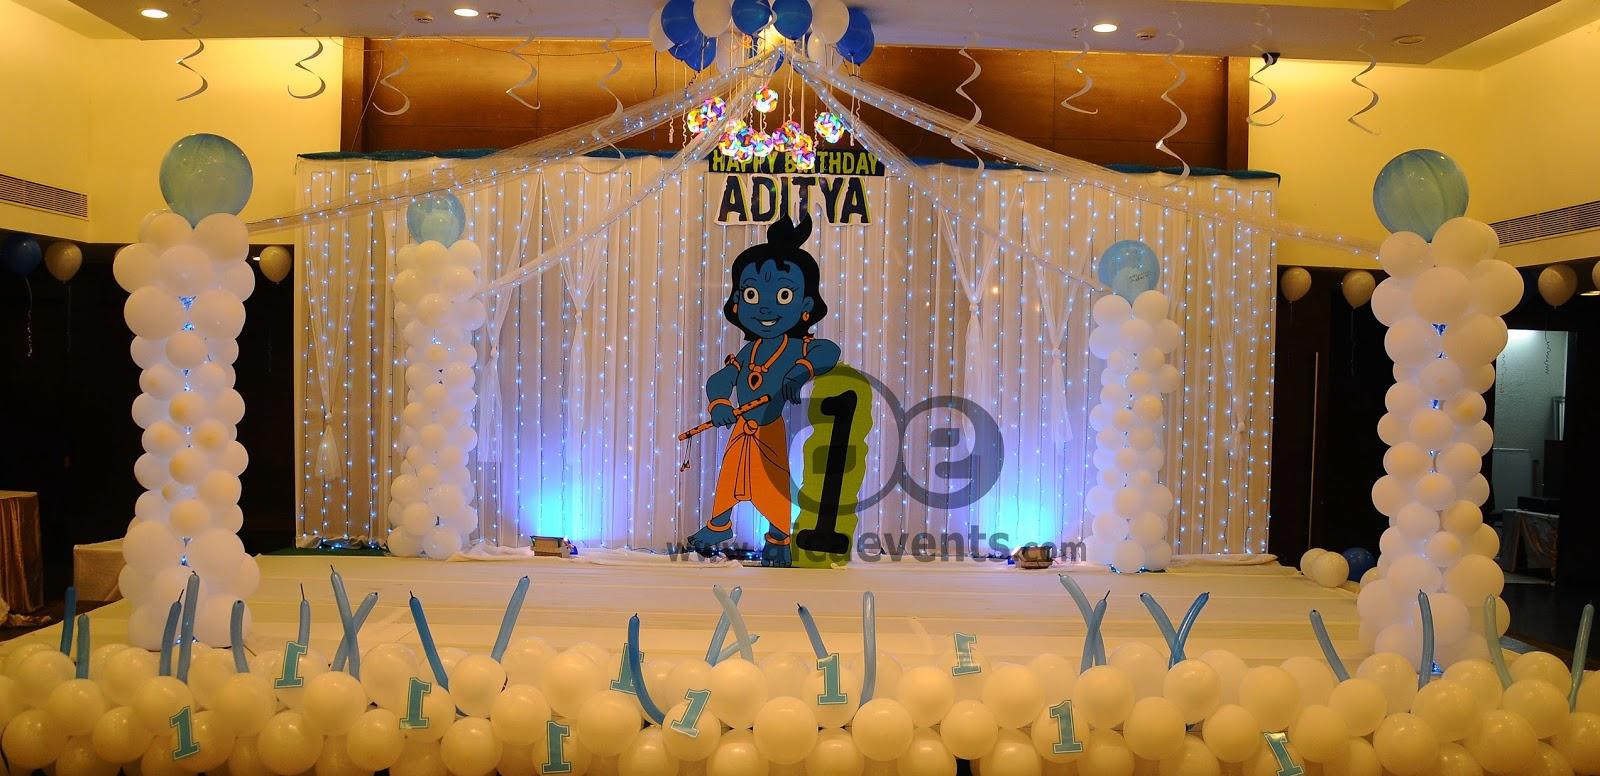 Aicaevents India Krishna Theme Birthday Party Decorations